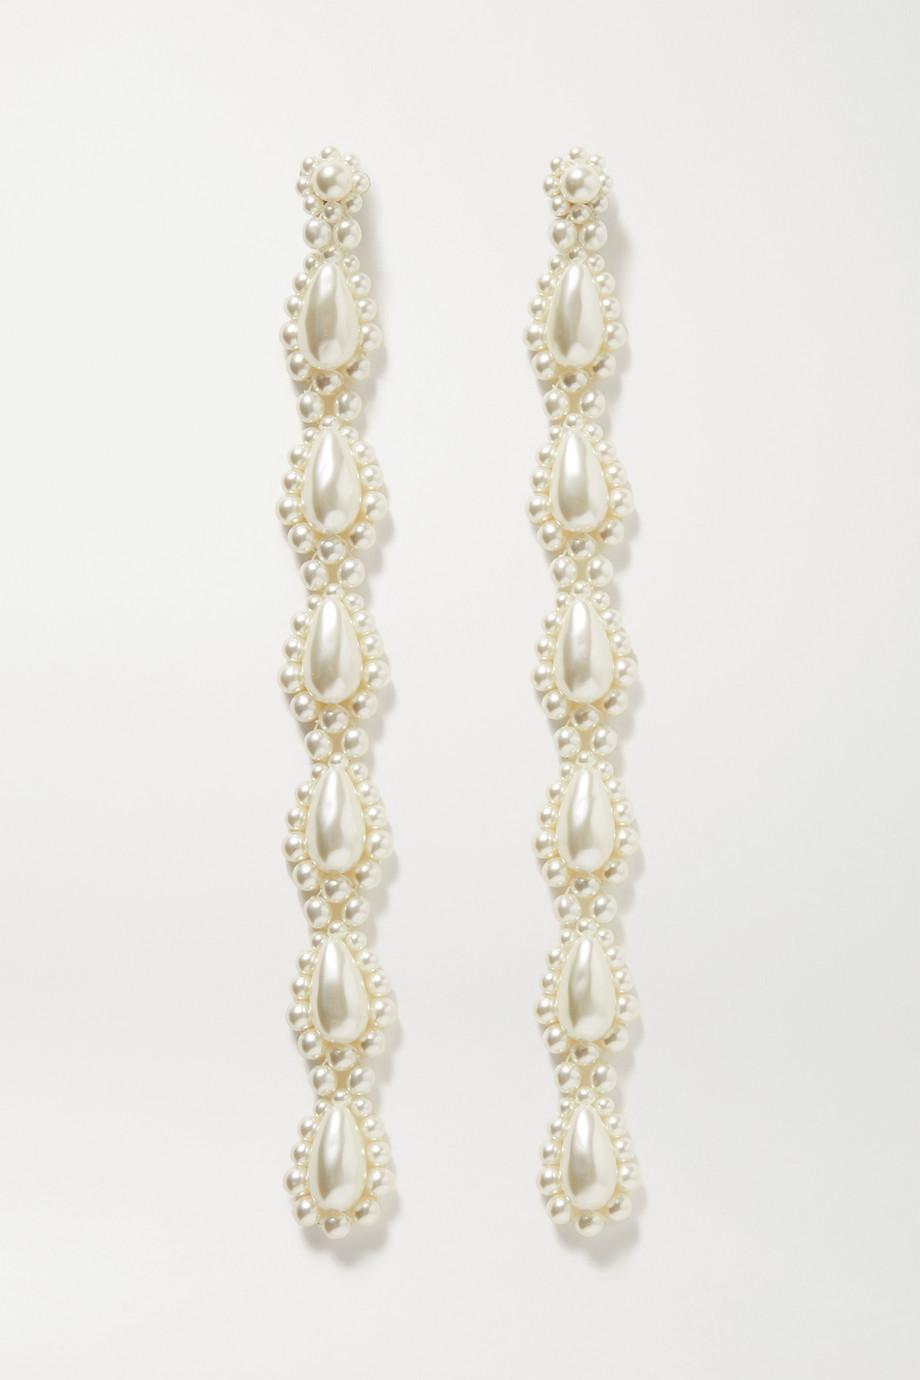 Simone Rocha Gold-tone faux pearl earrings